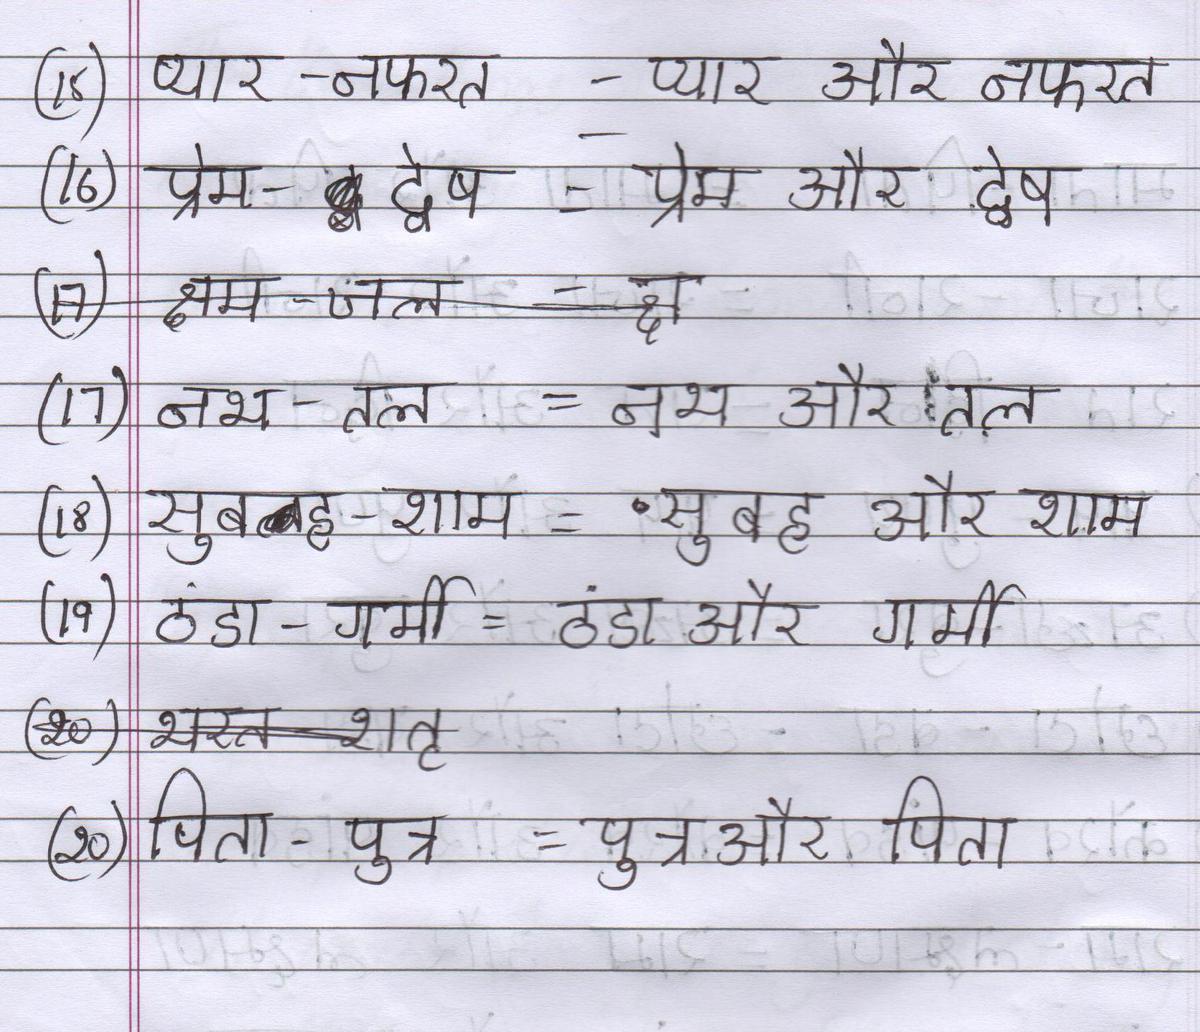 I Want 20 Dwand Samas In Hindi Plz